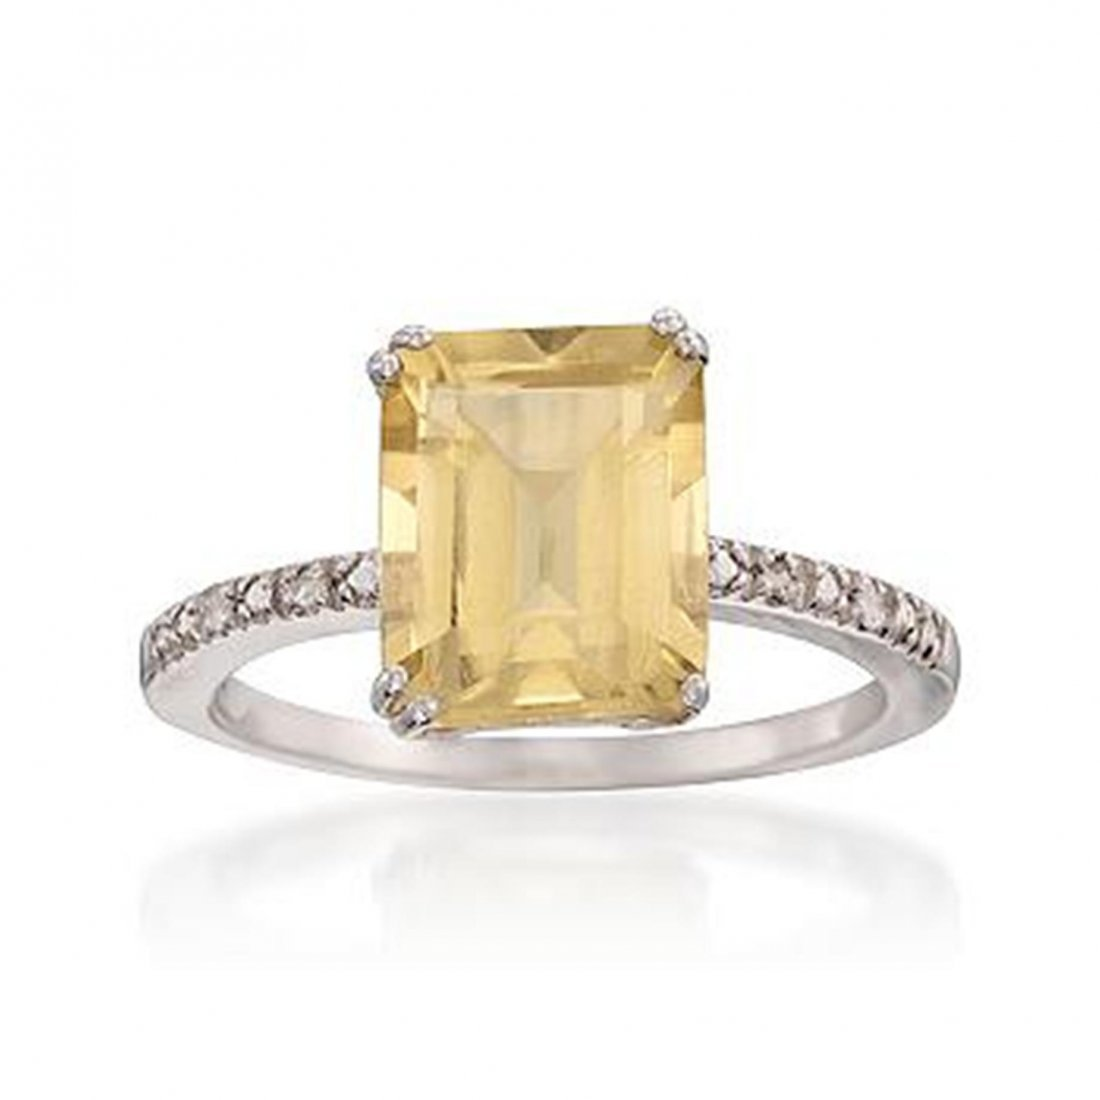 3.30 Carat Lemon Quartz Ring With Diamonds in Sterling